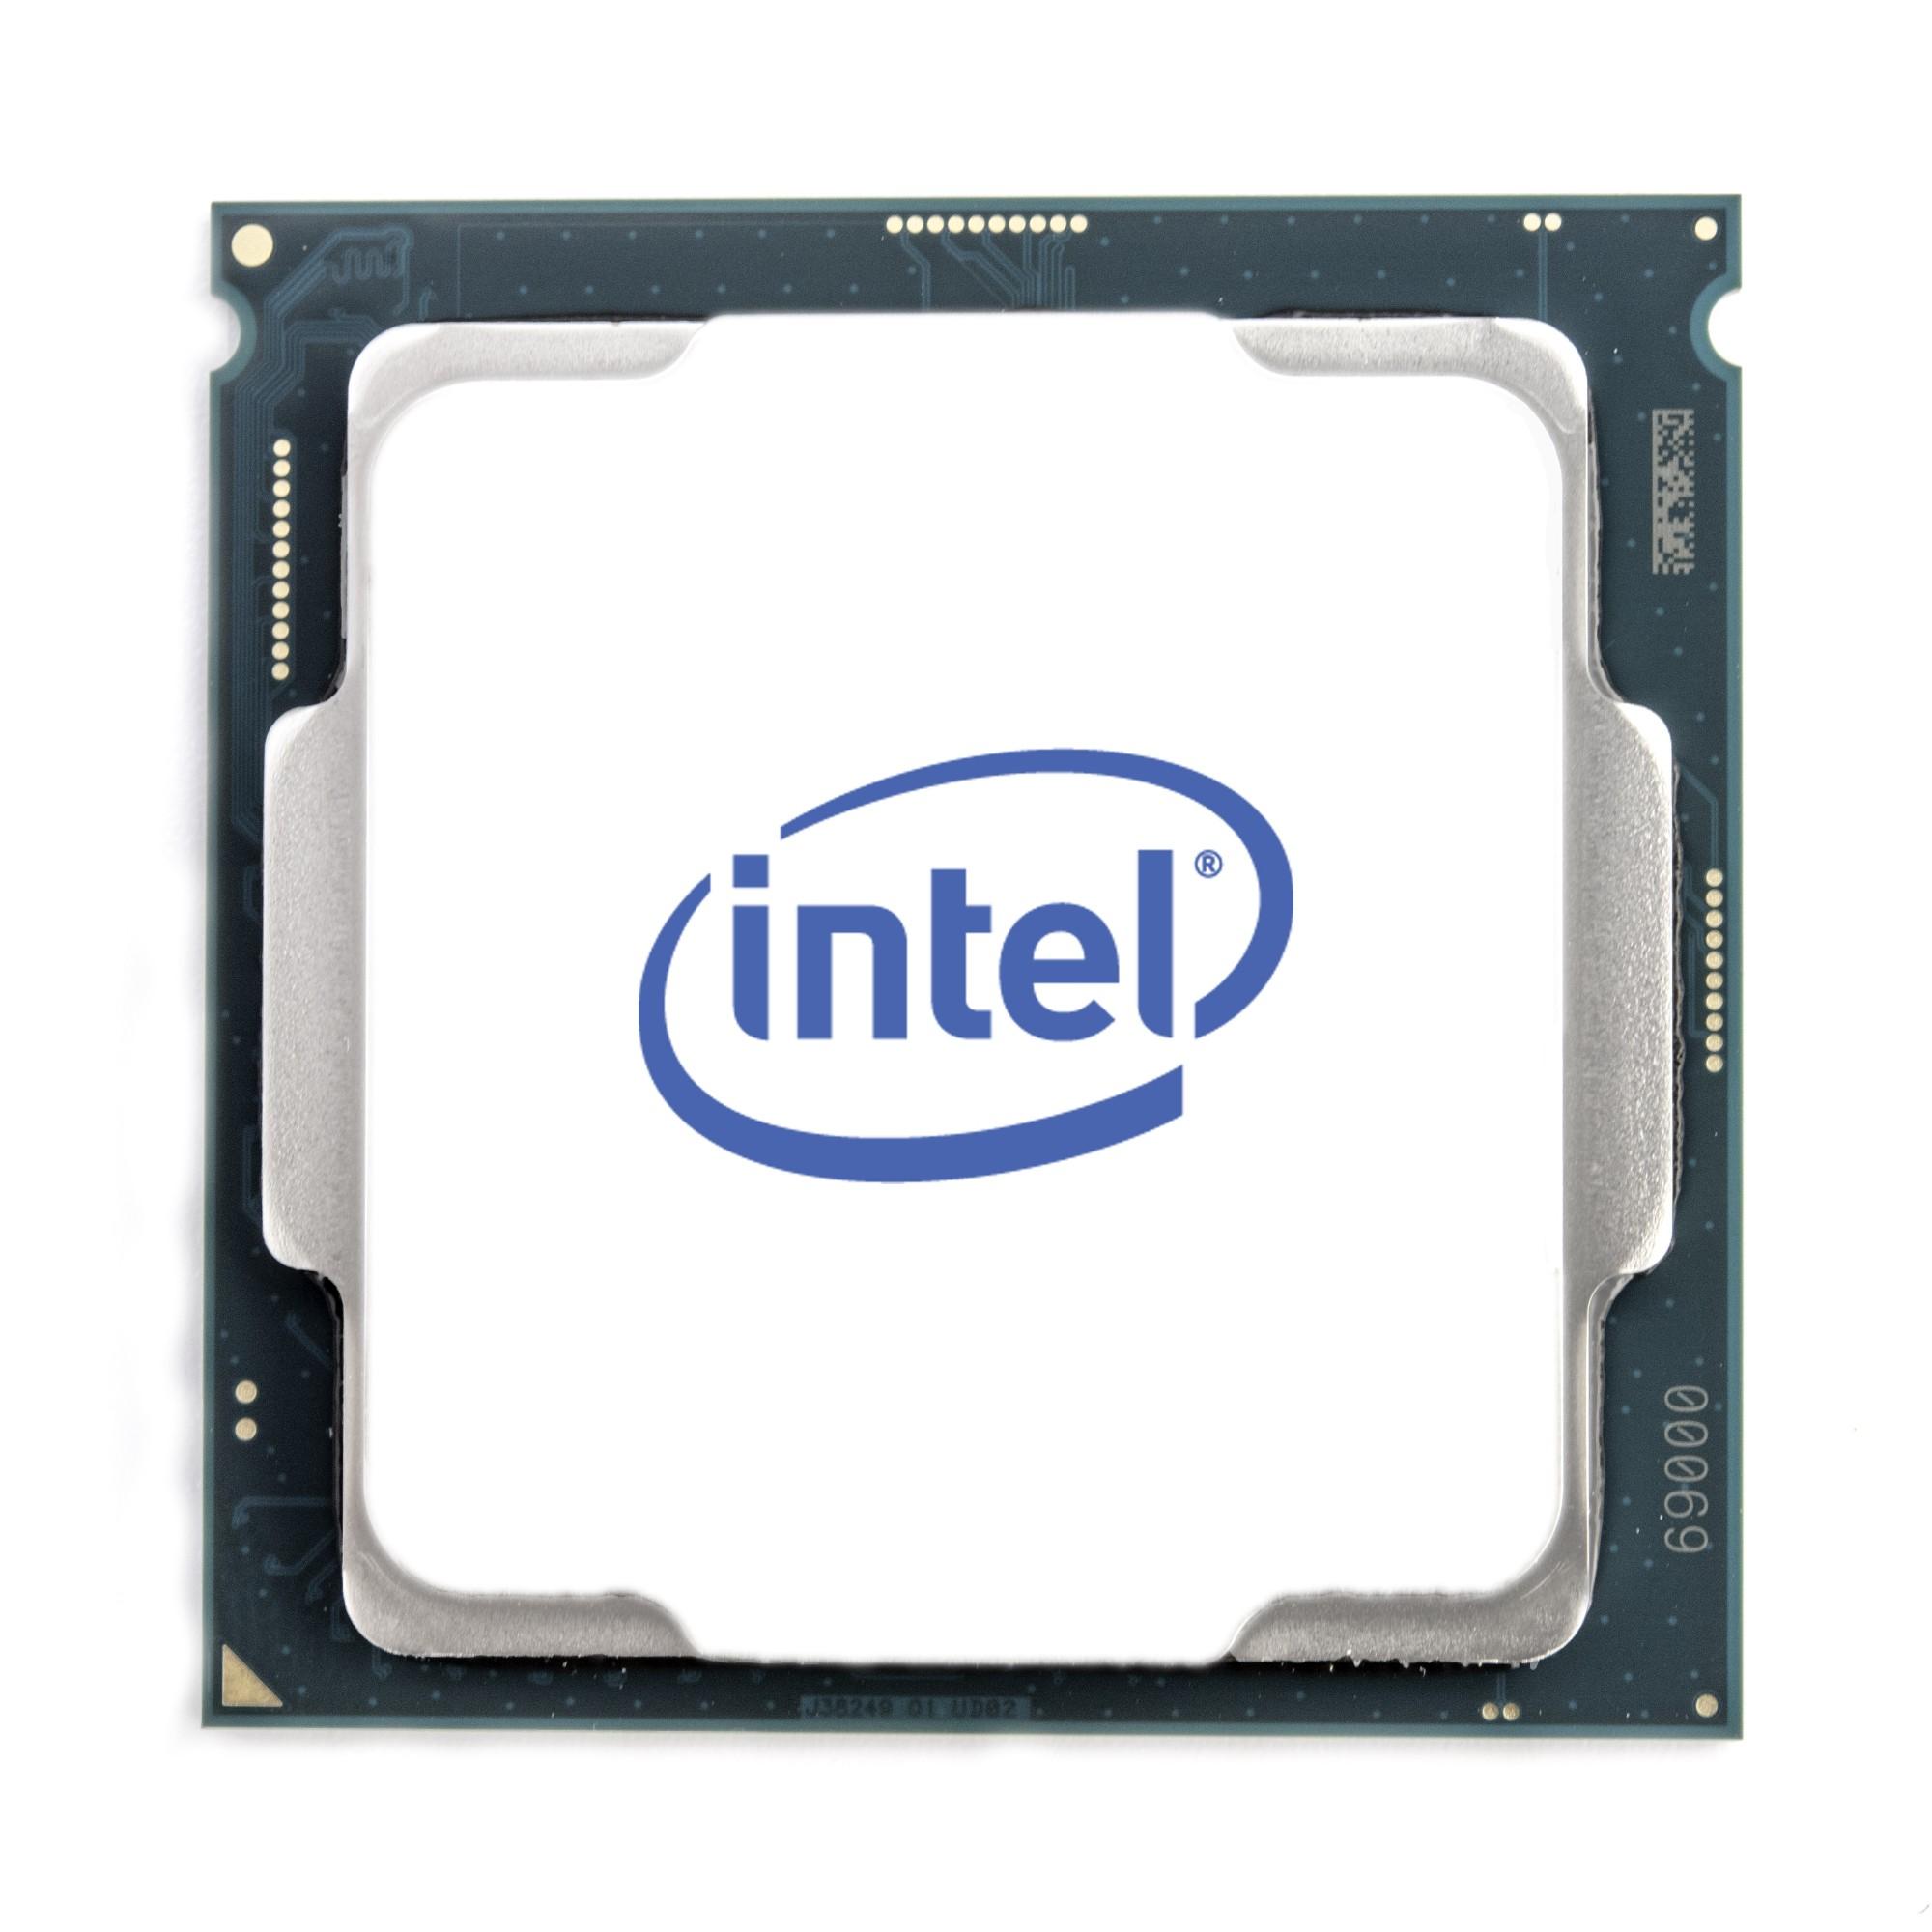 Intel Xeon E-2236 processor 3.4 GHz Box 12 MB